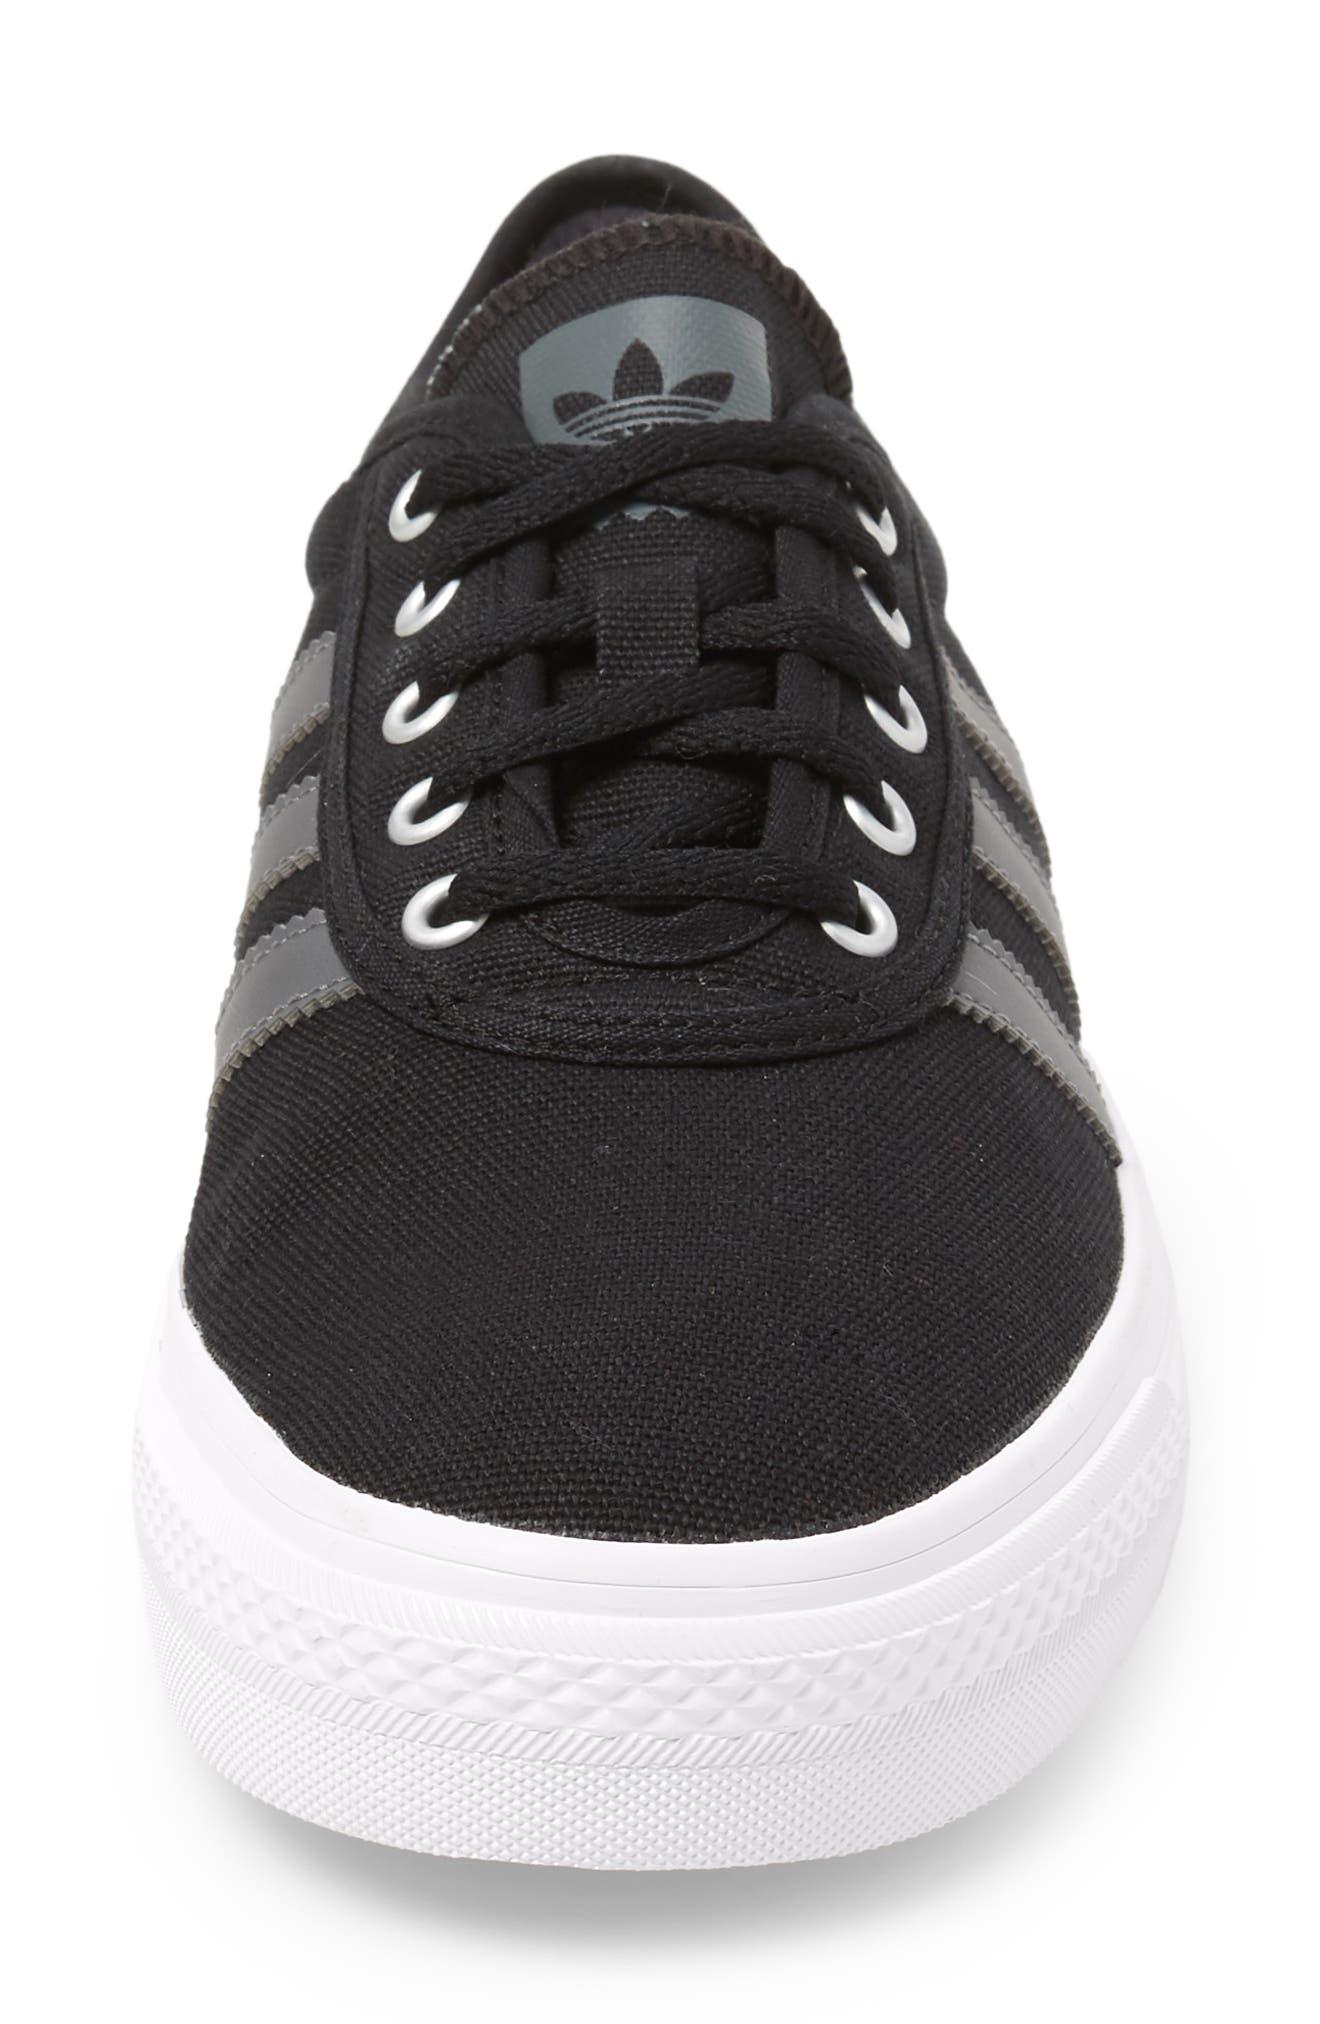 Adiease Skate Sneaker,                             Alternate thumbnail 4, color,                             001